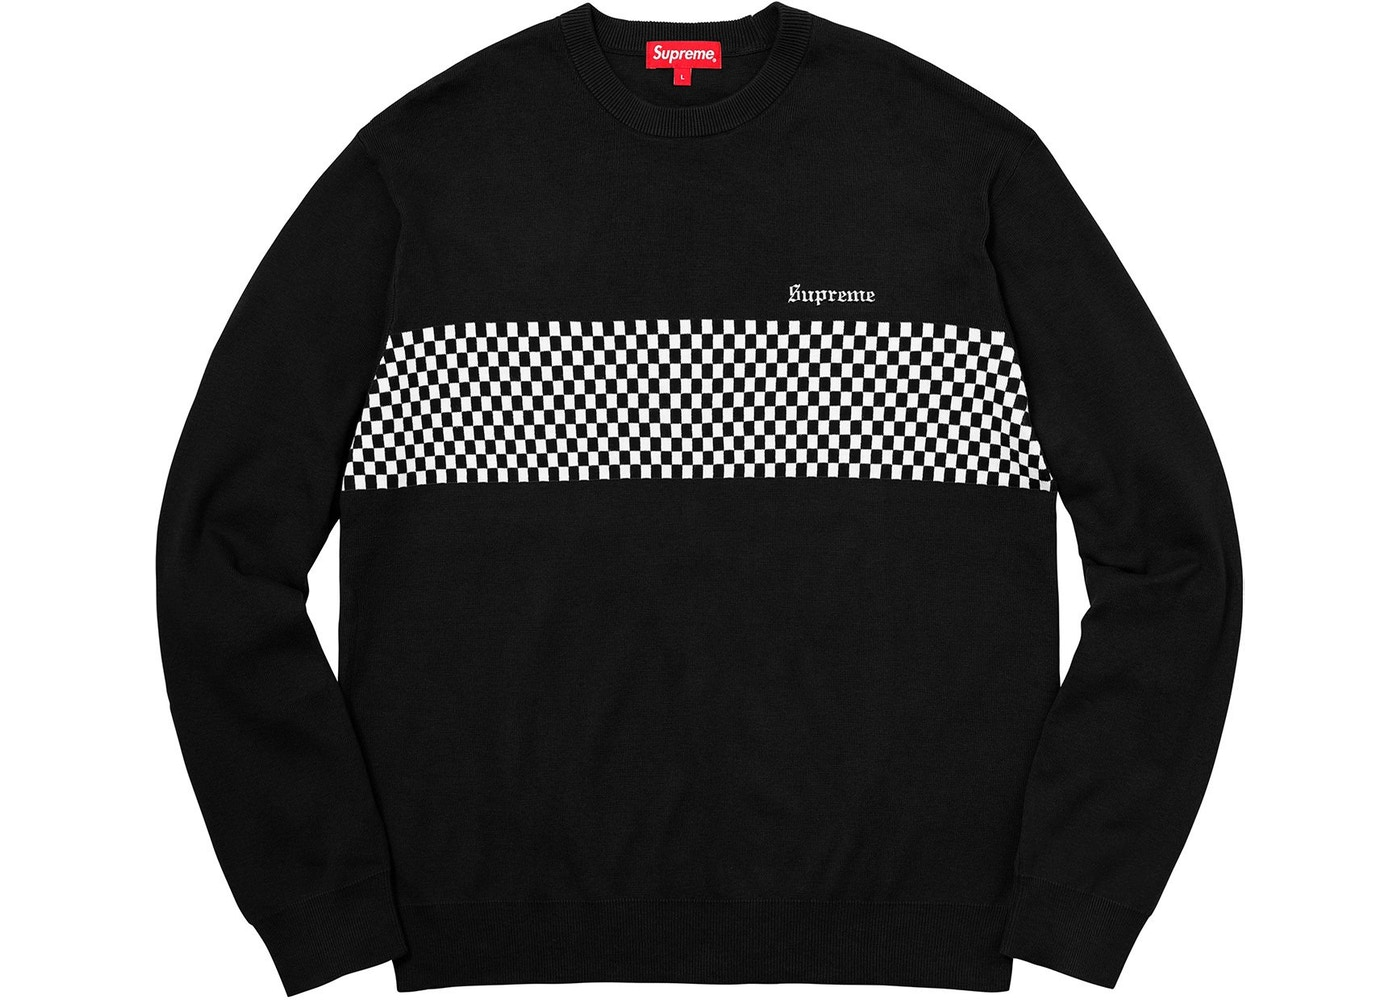 484a1647fb52 Supreme Checkered Panel Crewneck Sweater Black - SS18